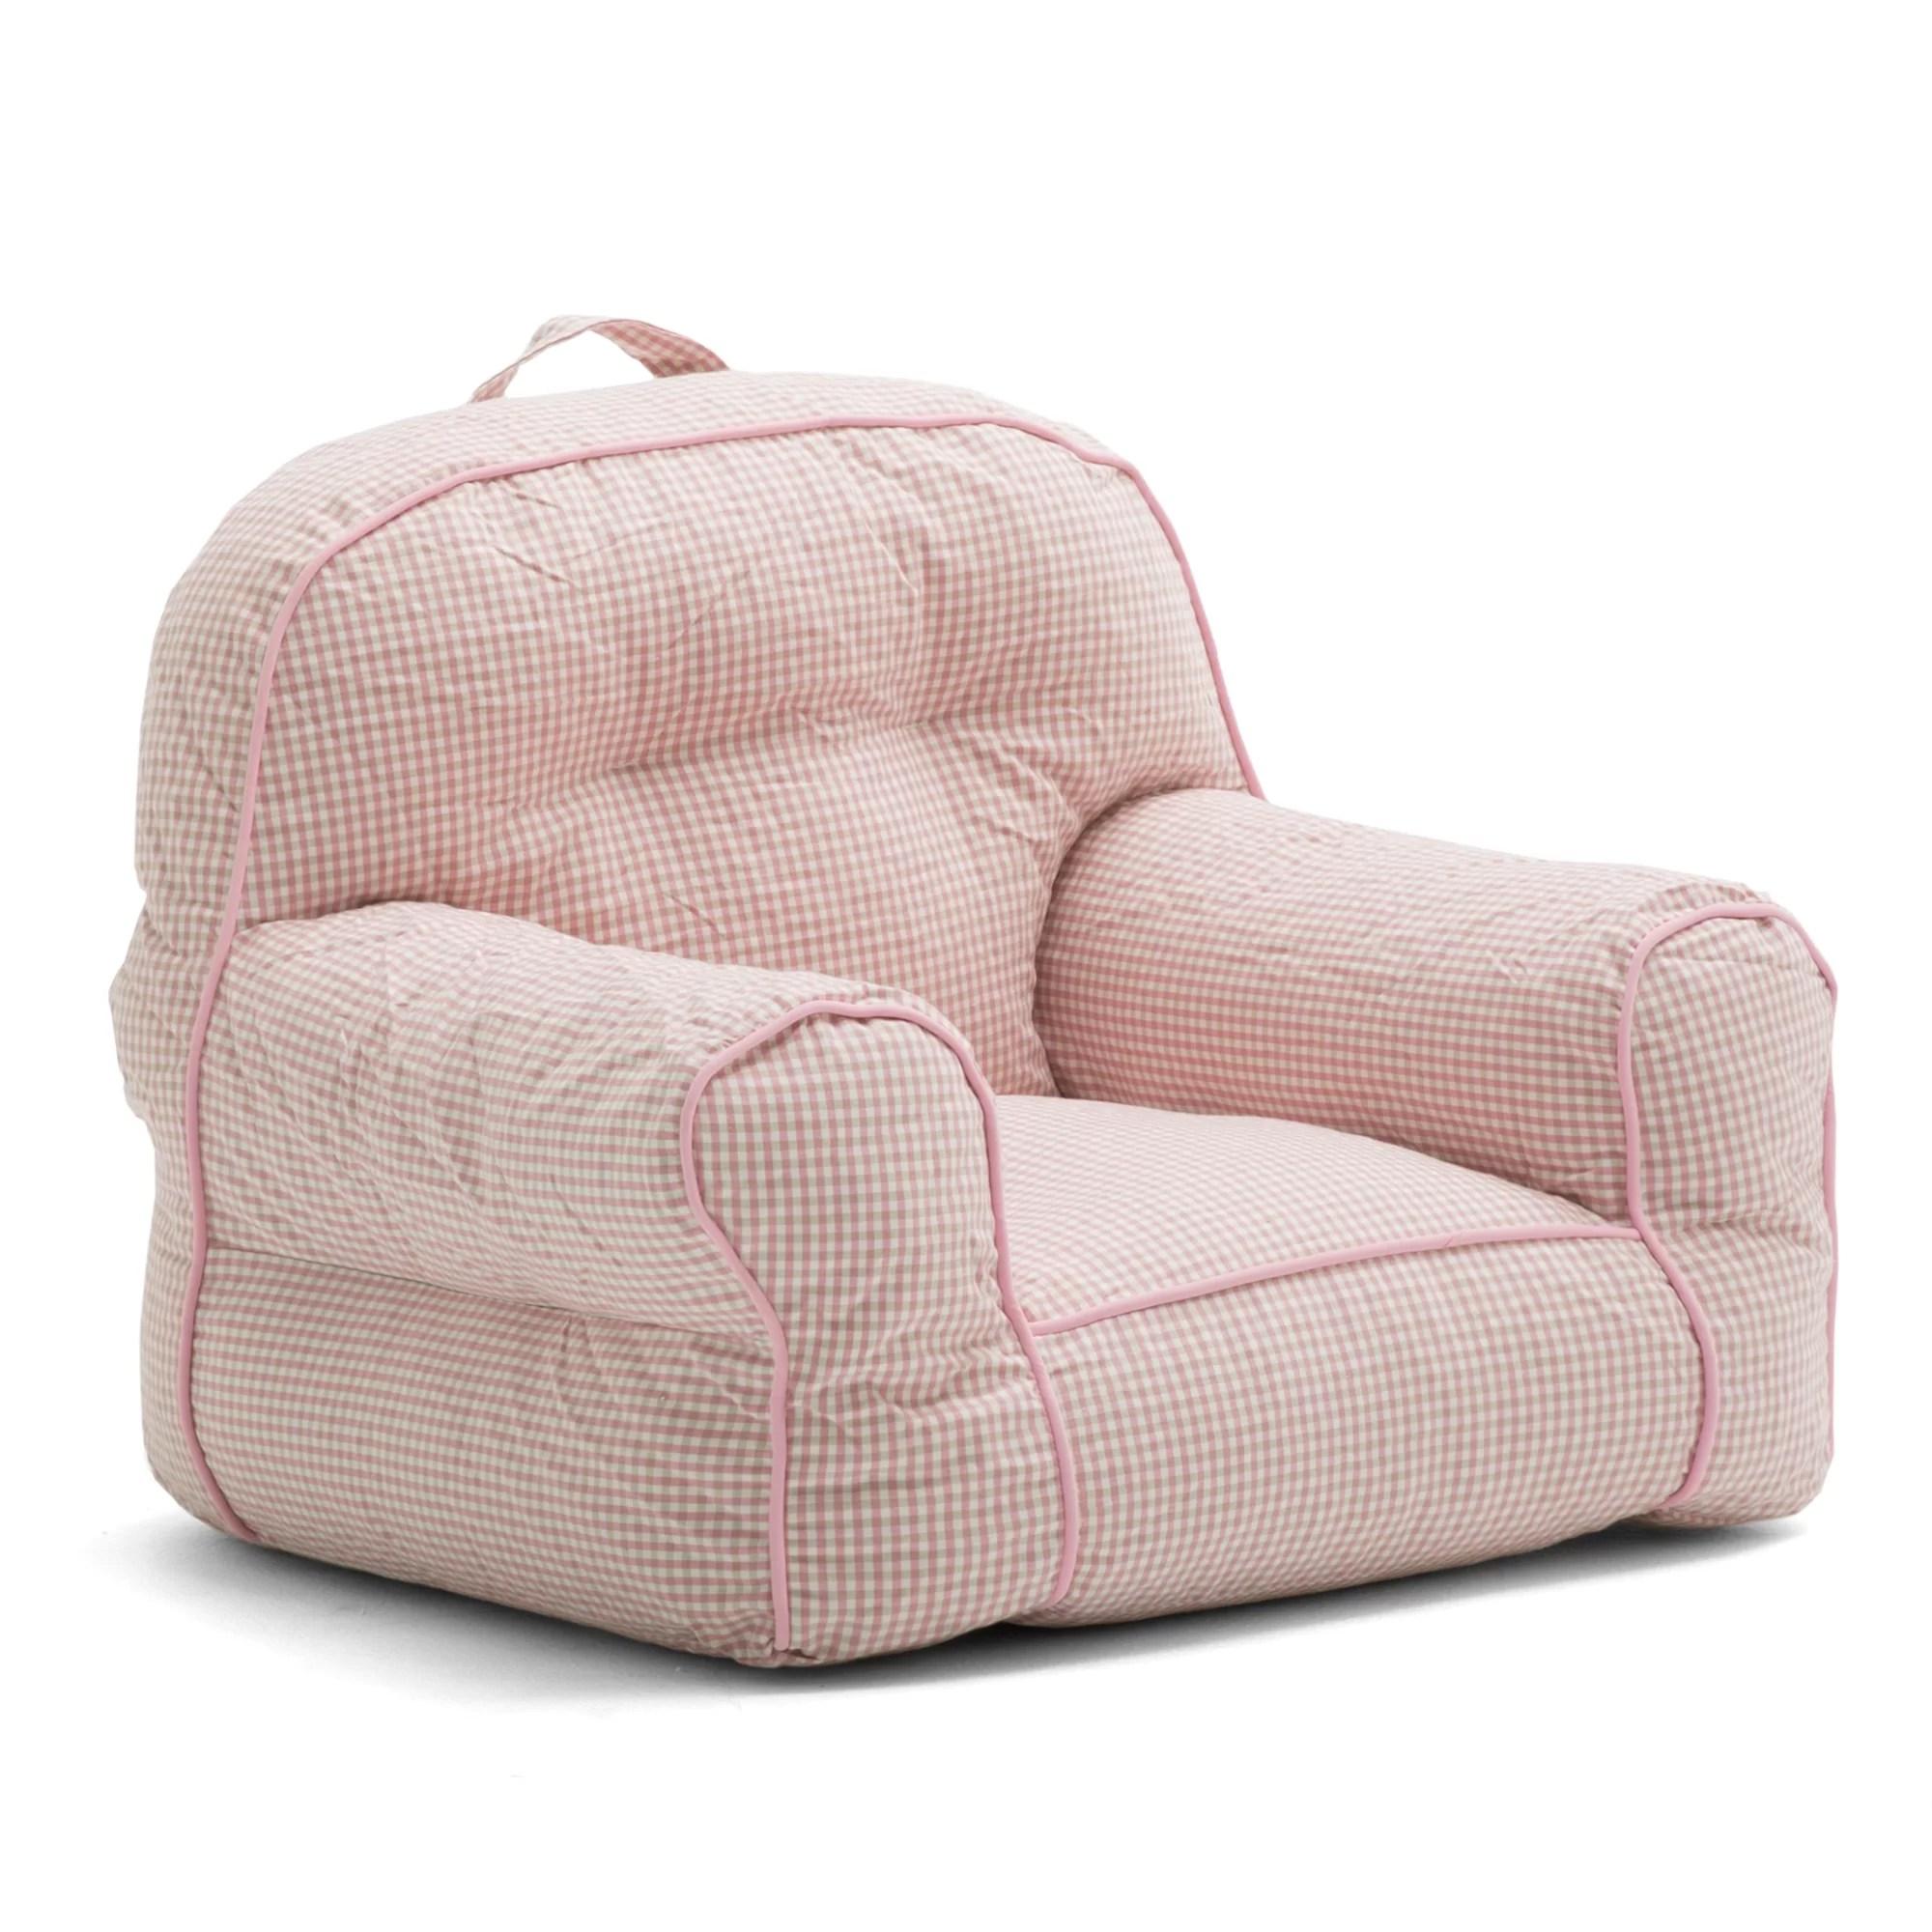 big joe bean bag chair office waiting room chairs cheap comfort research junior gingham